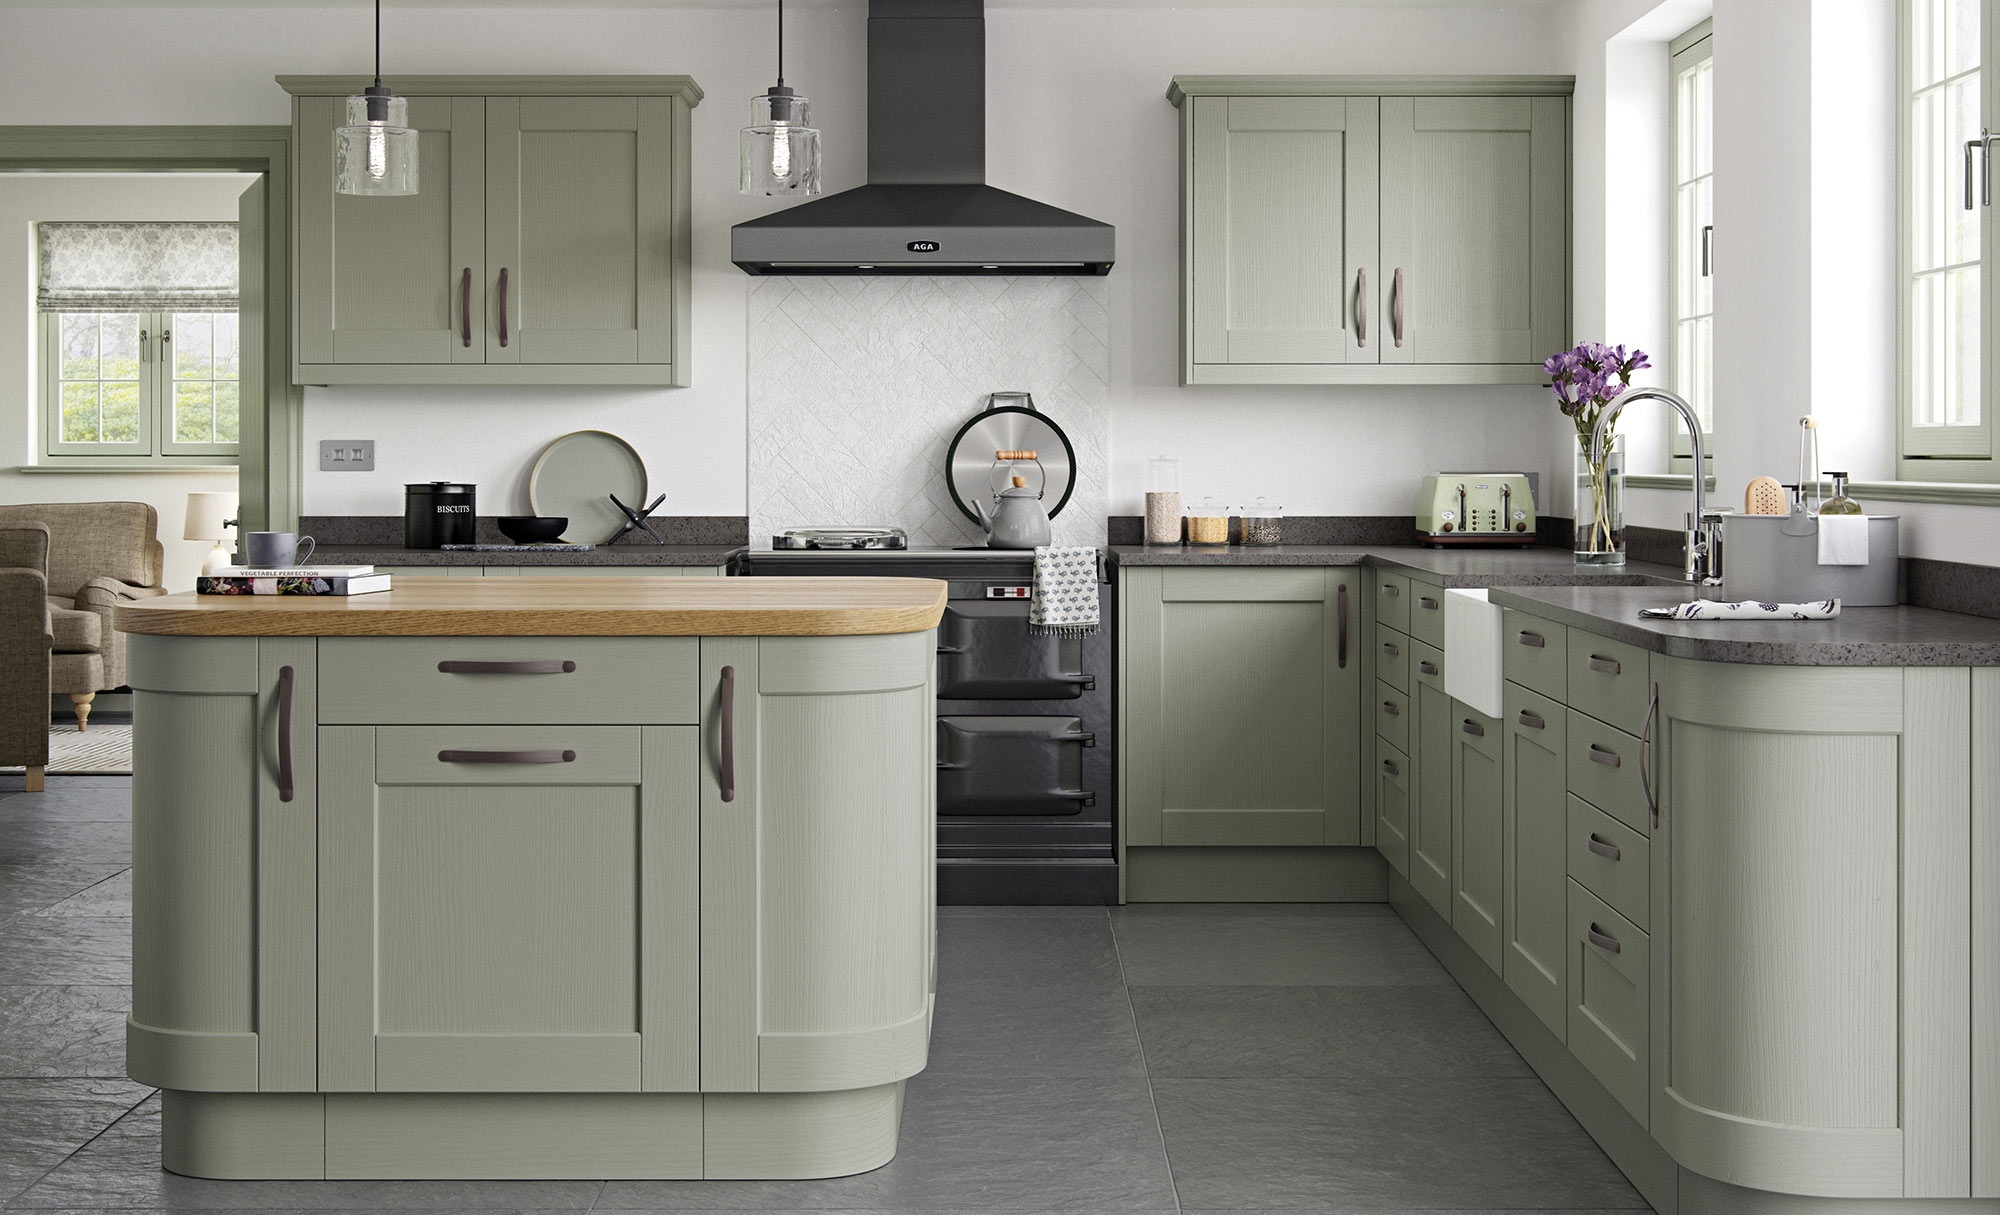 Uform Kensington Sage Green  Kitchen